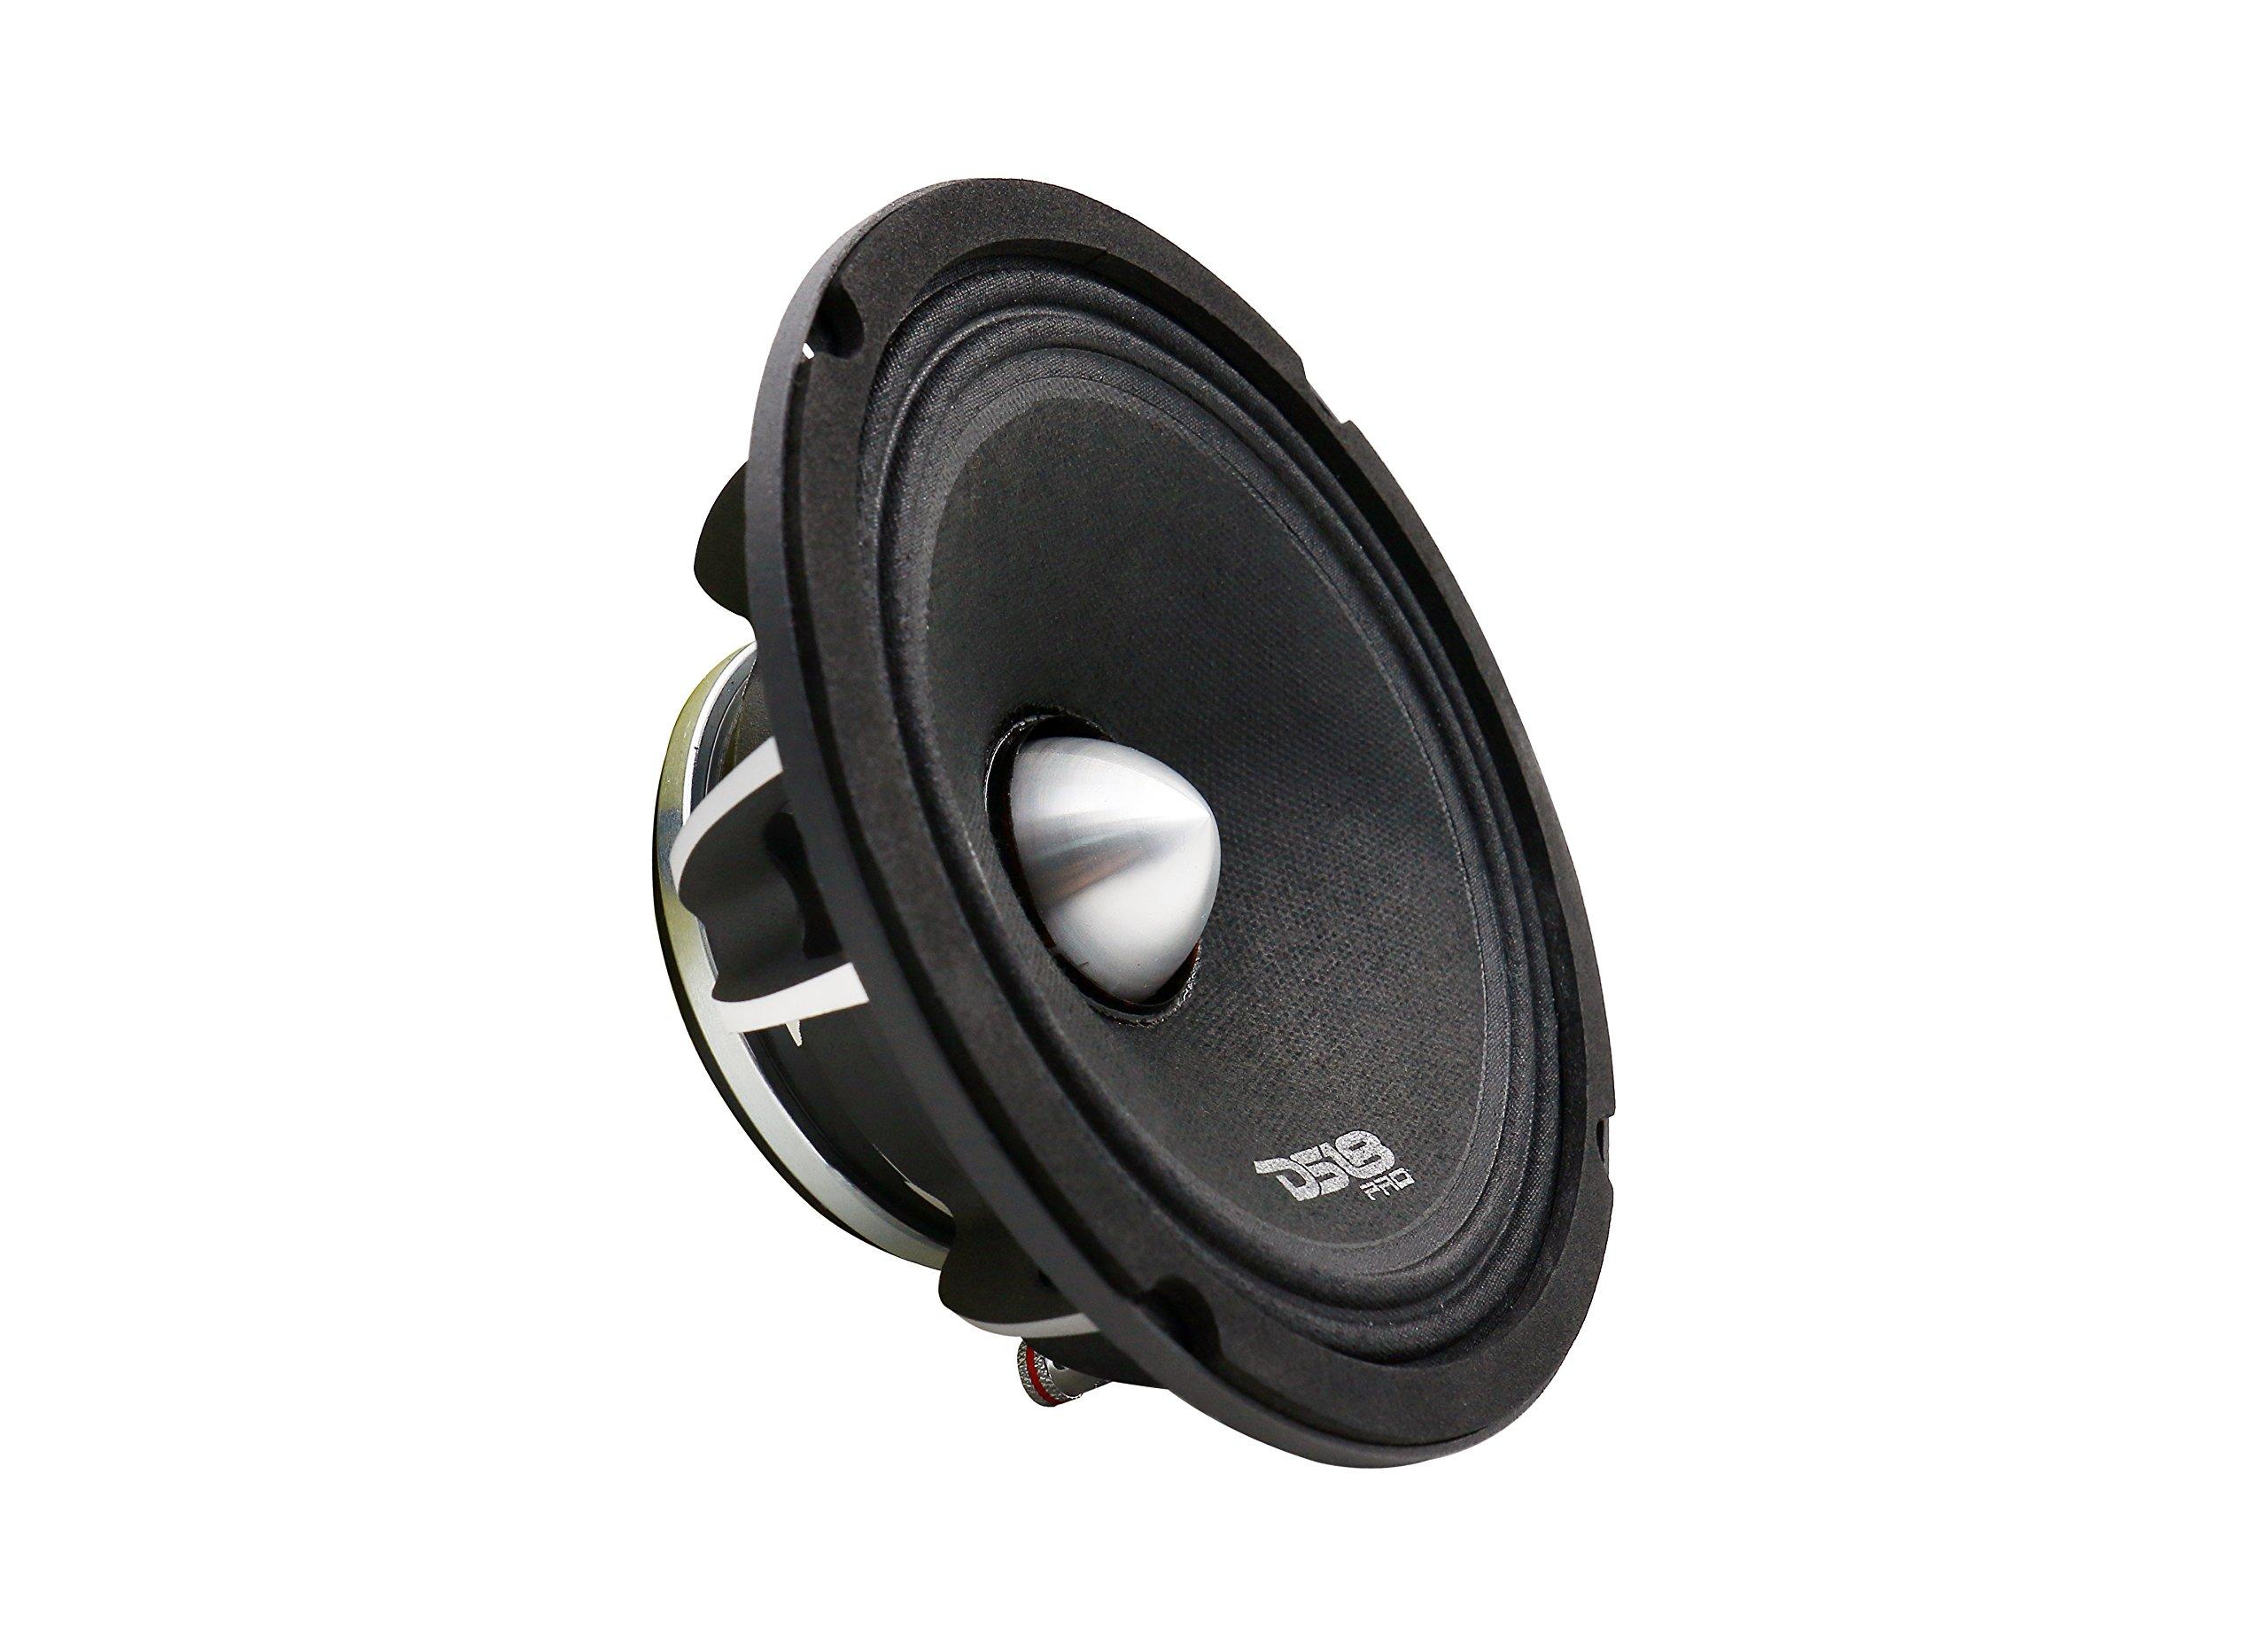 DS18 PRO-FR6NEO Loudspeaker- 6.5'', Full-Range, Silver Aluminum Bullet, 500W Max, 250W RMS, 4 Ohms, Neodymium Magnet - The Most Elegant Neodymium Full Range Loudspeakers Available